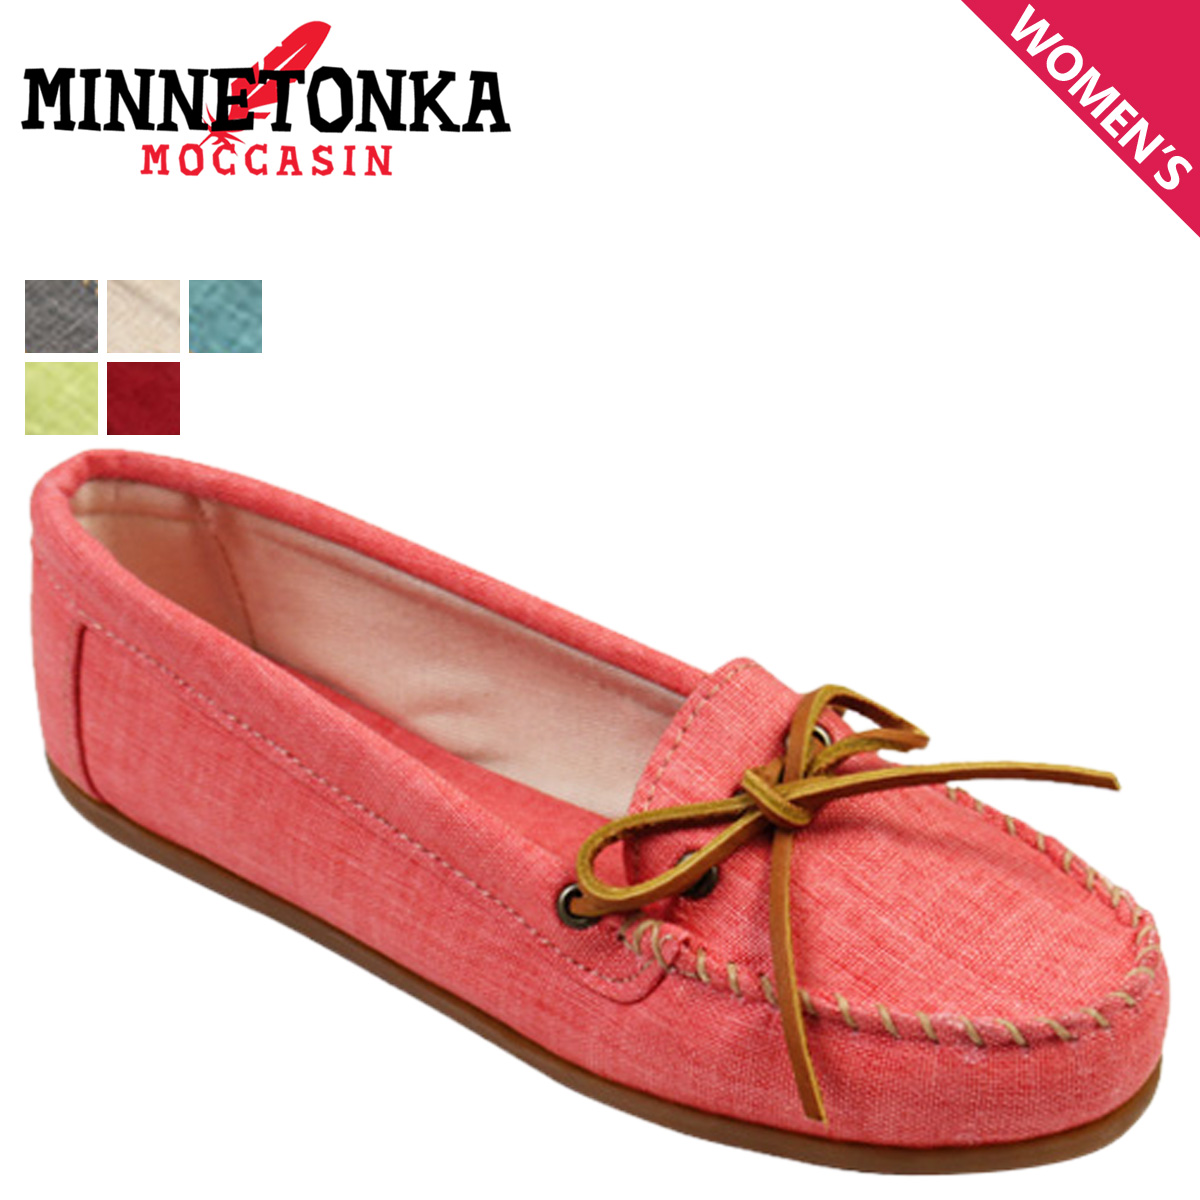 a9e9462fc775ca Minnetonka MINNETONKA moccasins canvas mock 4 colors CANVAS MOC Womens 2014  new limited 230 231 235 ...